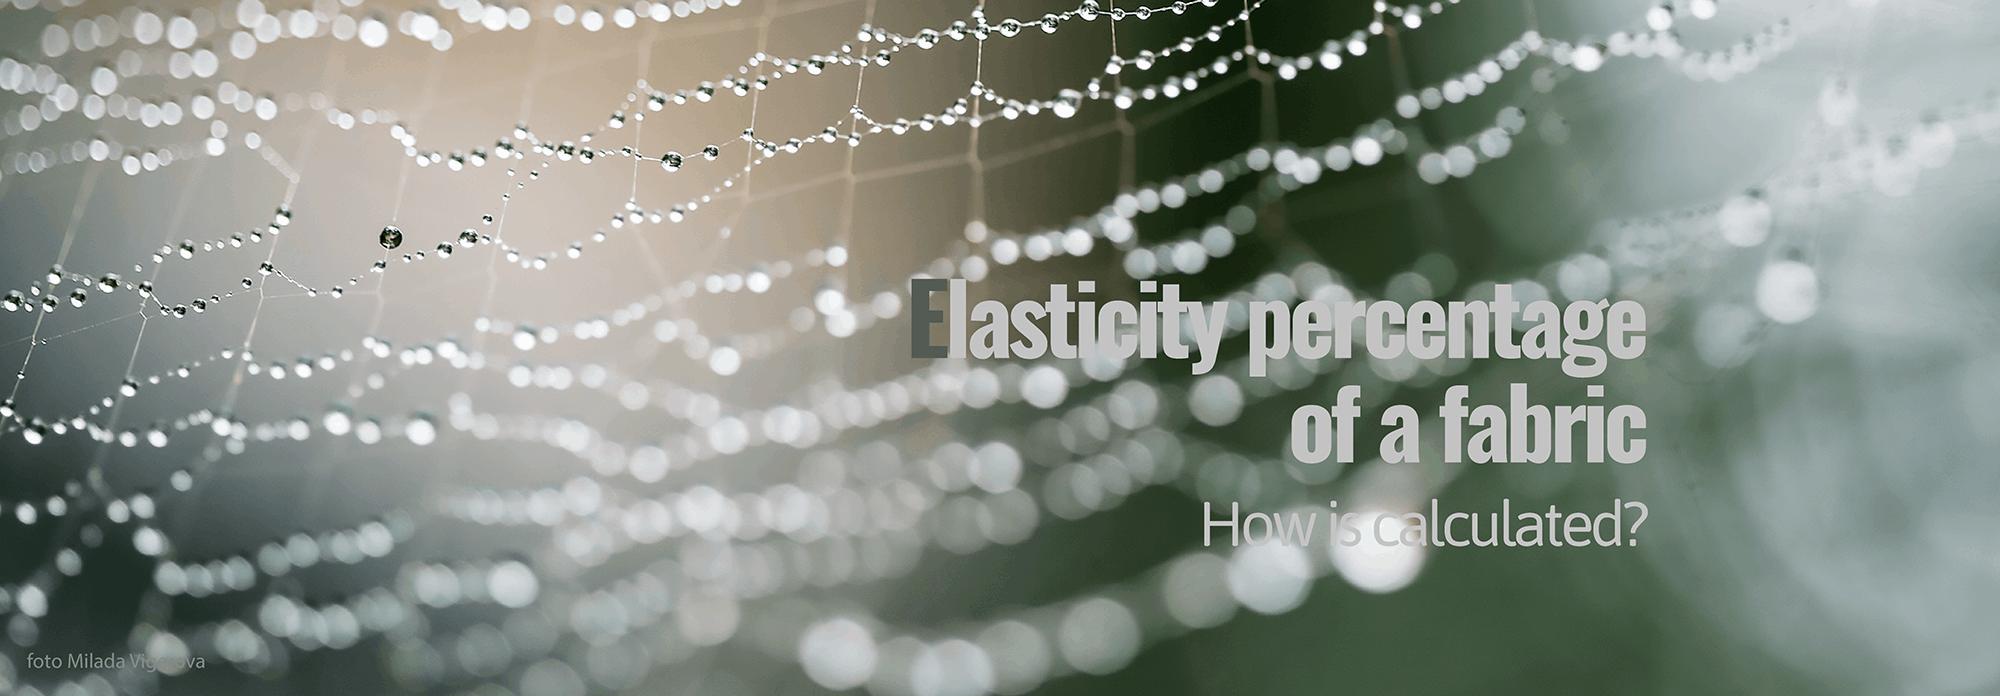 Elasticity percentage of a fabric